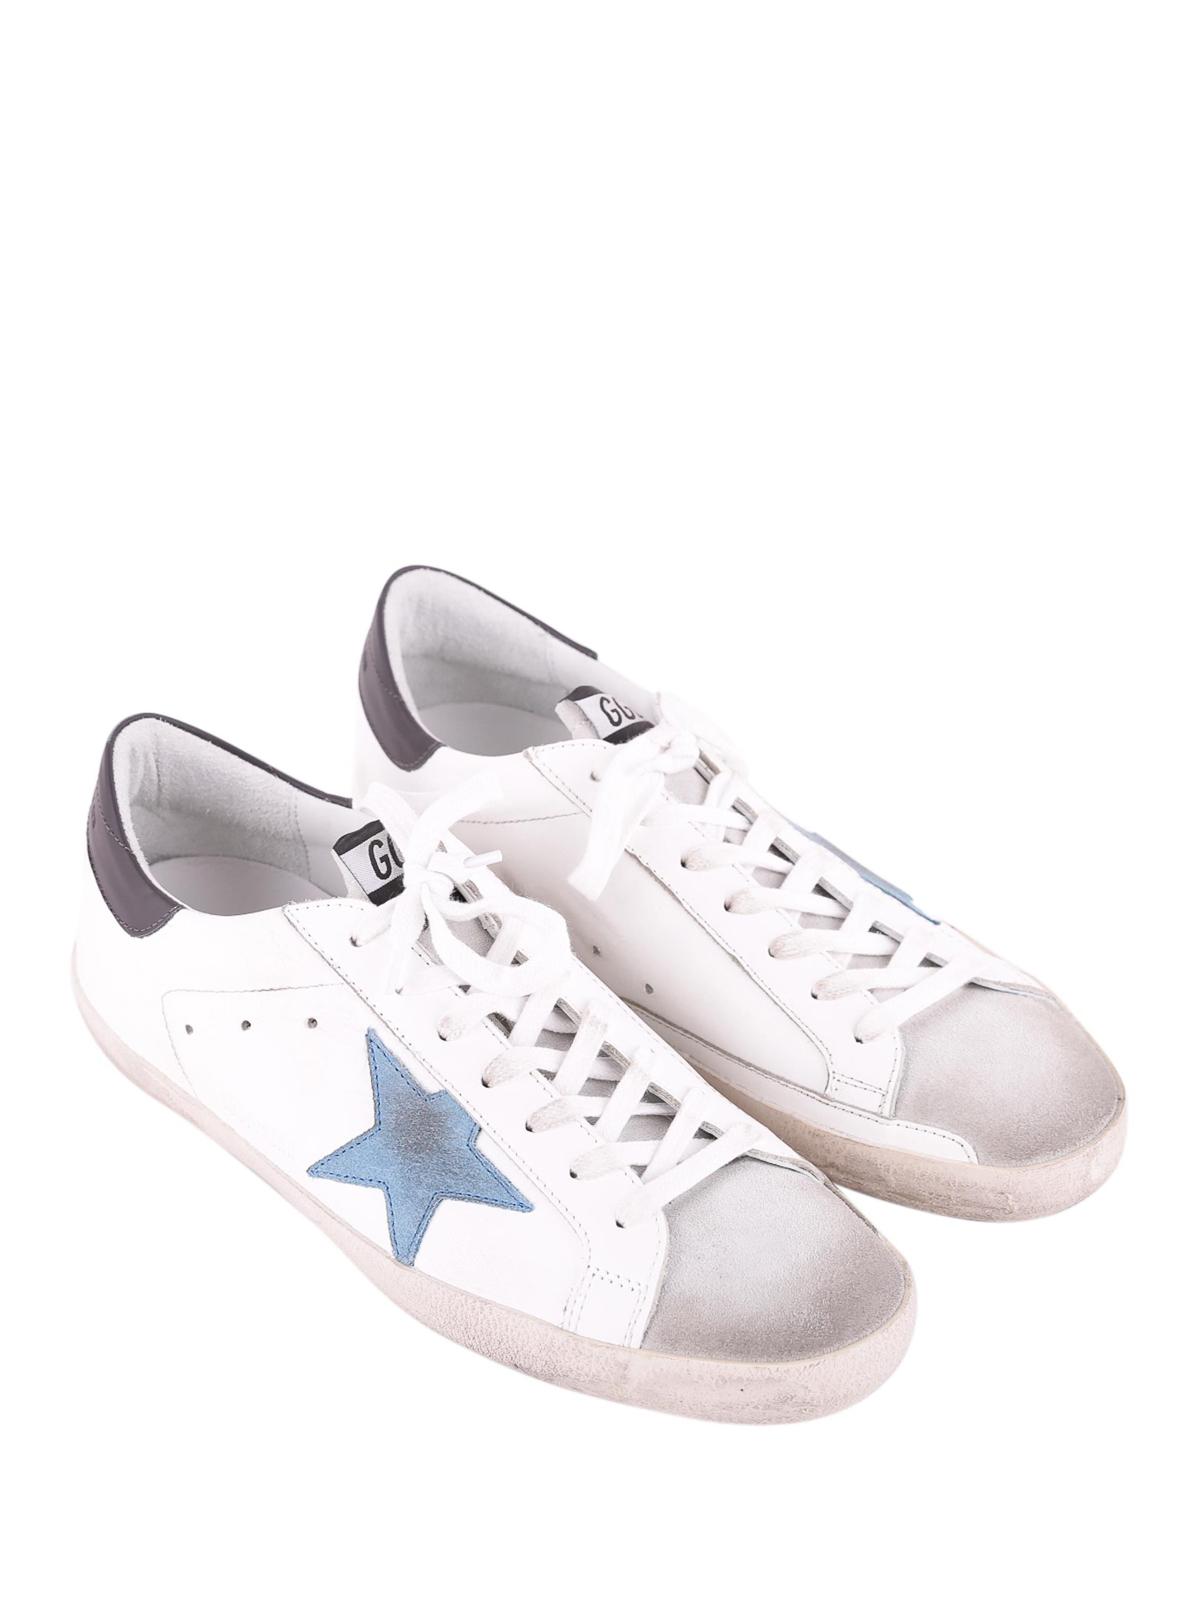 a2975f33f07 GOLDEN GOOSE  trainers online - Superstar light blue star sneakers